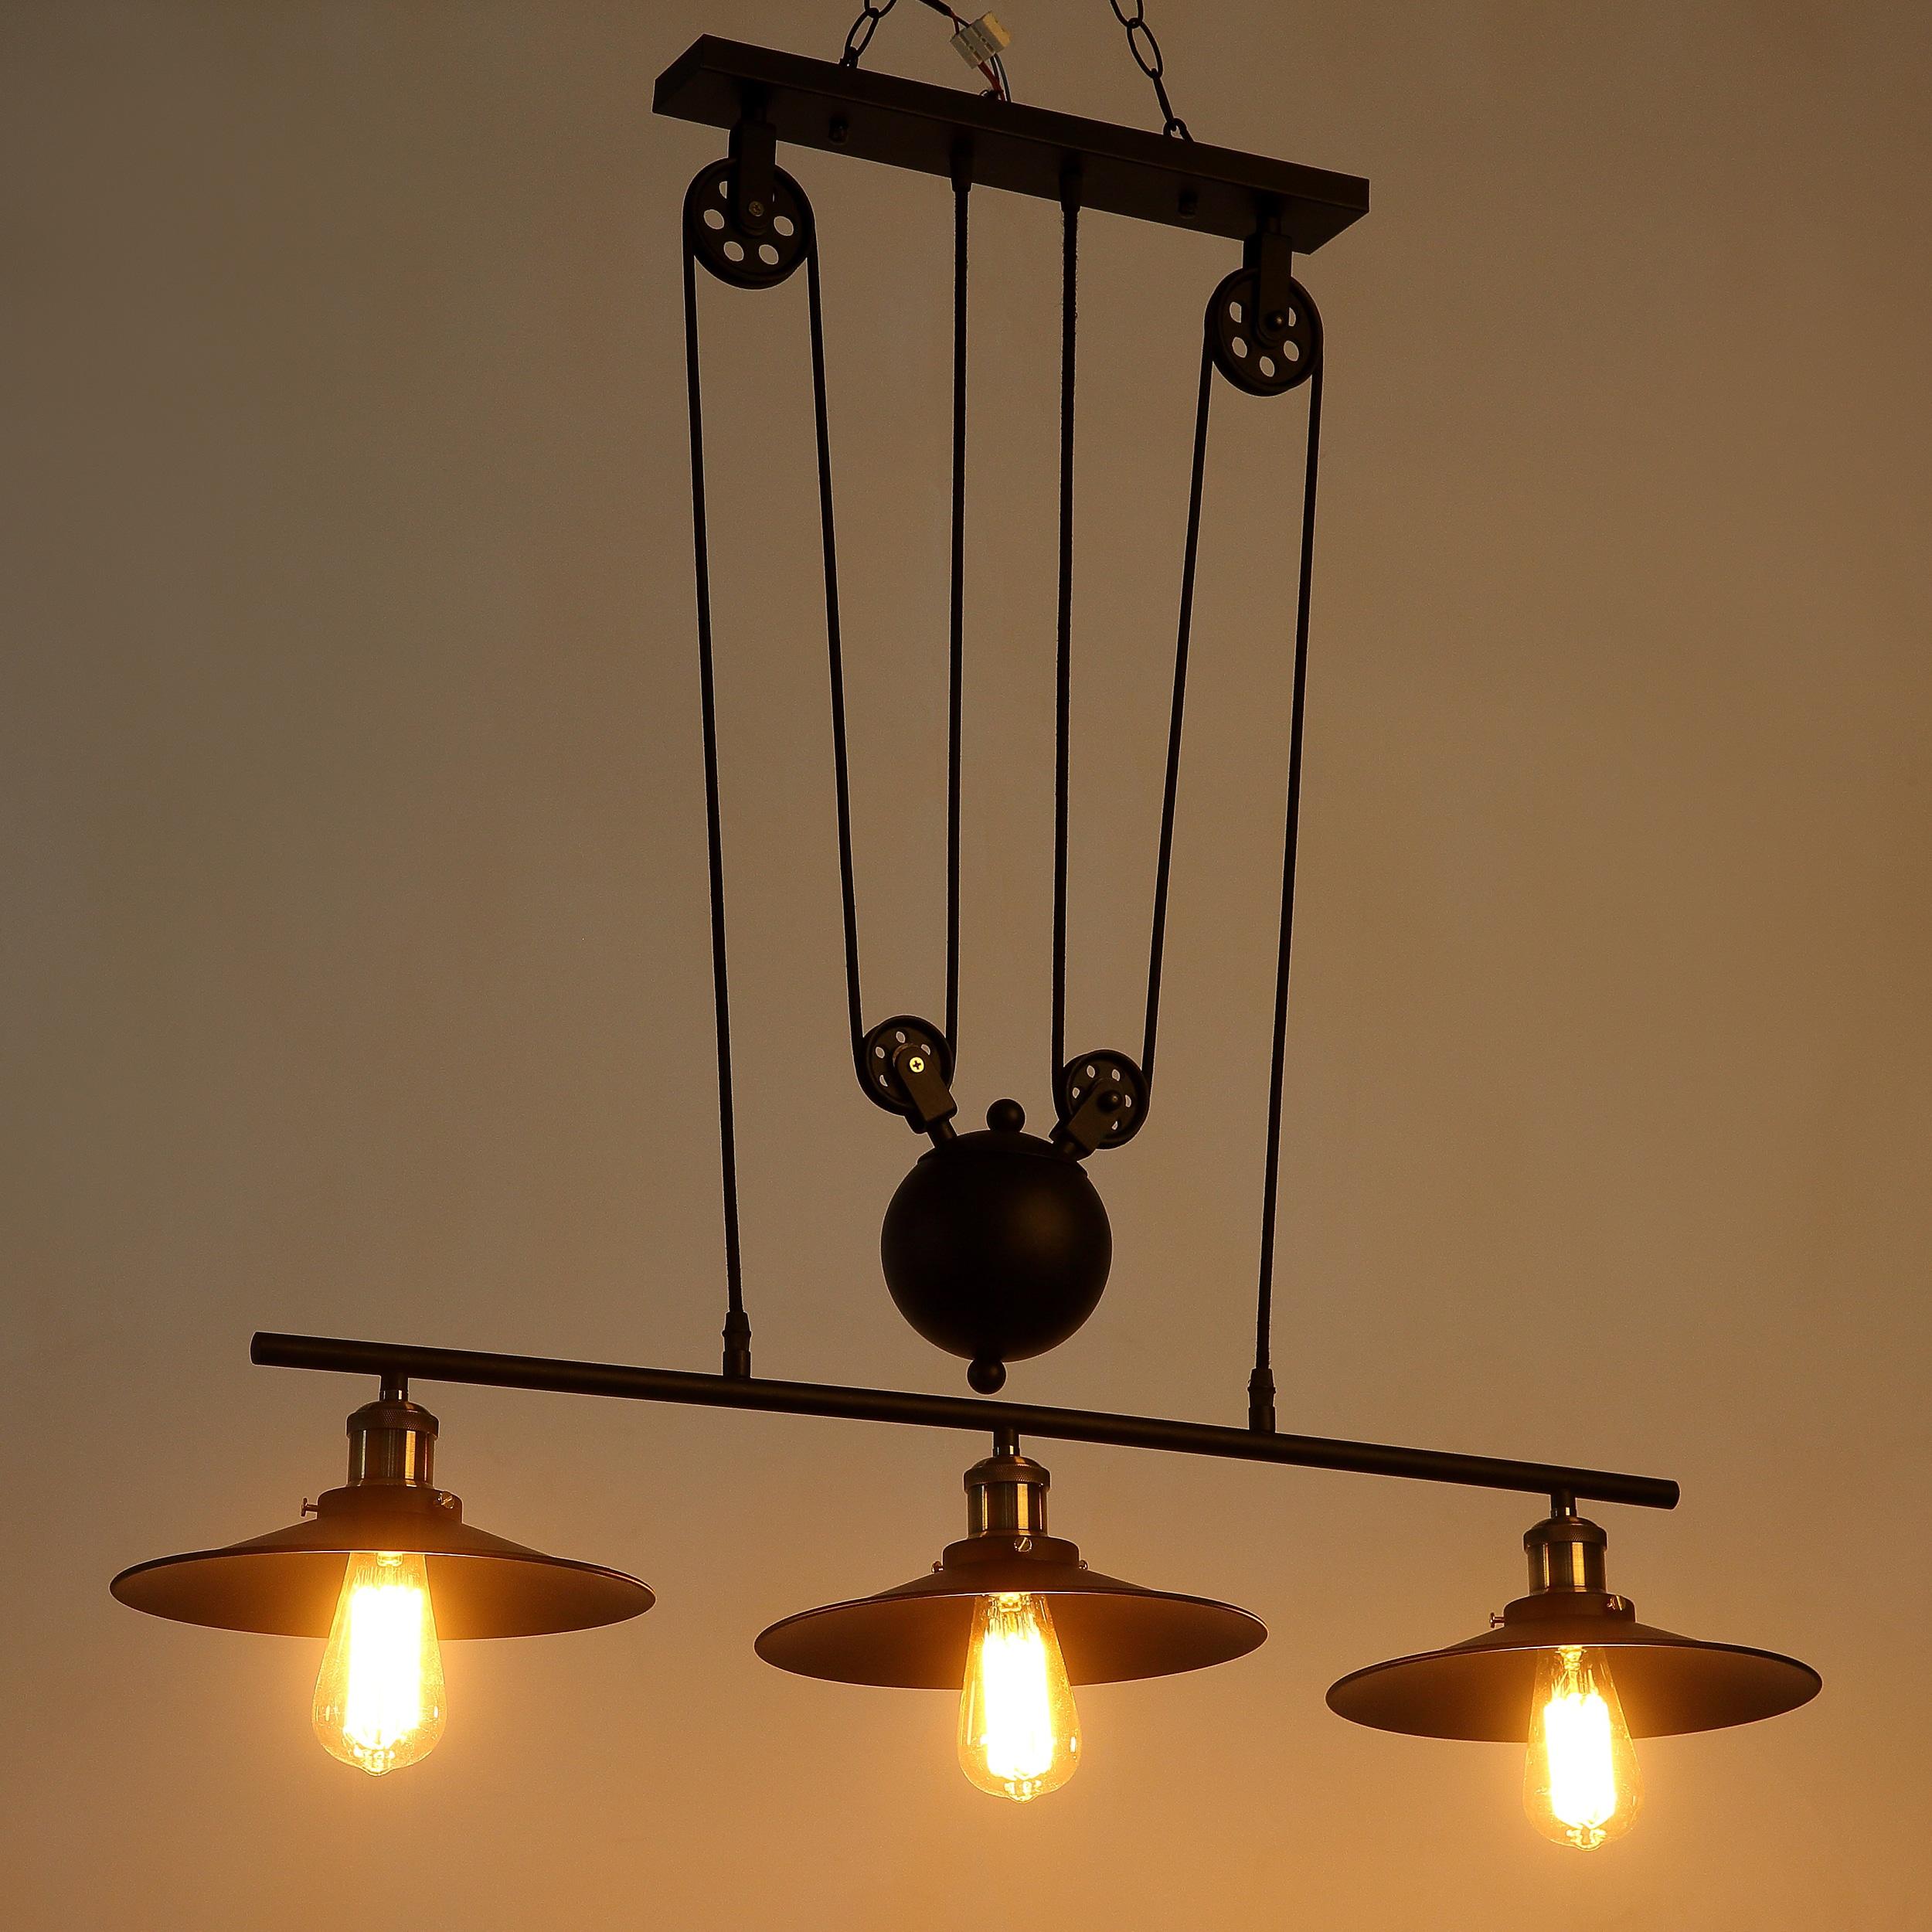 journee lighting. Journee Home \u0027Alexandrine\u0027 Pulley Hard Wired Island Pendant Light With 3 Included Edison Bulbs - Free Shipping Today Overstock 20677163 Lighting D